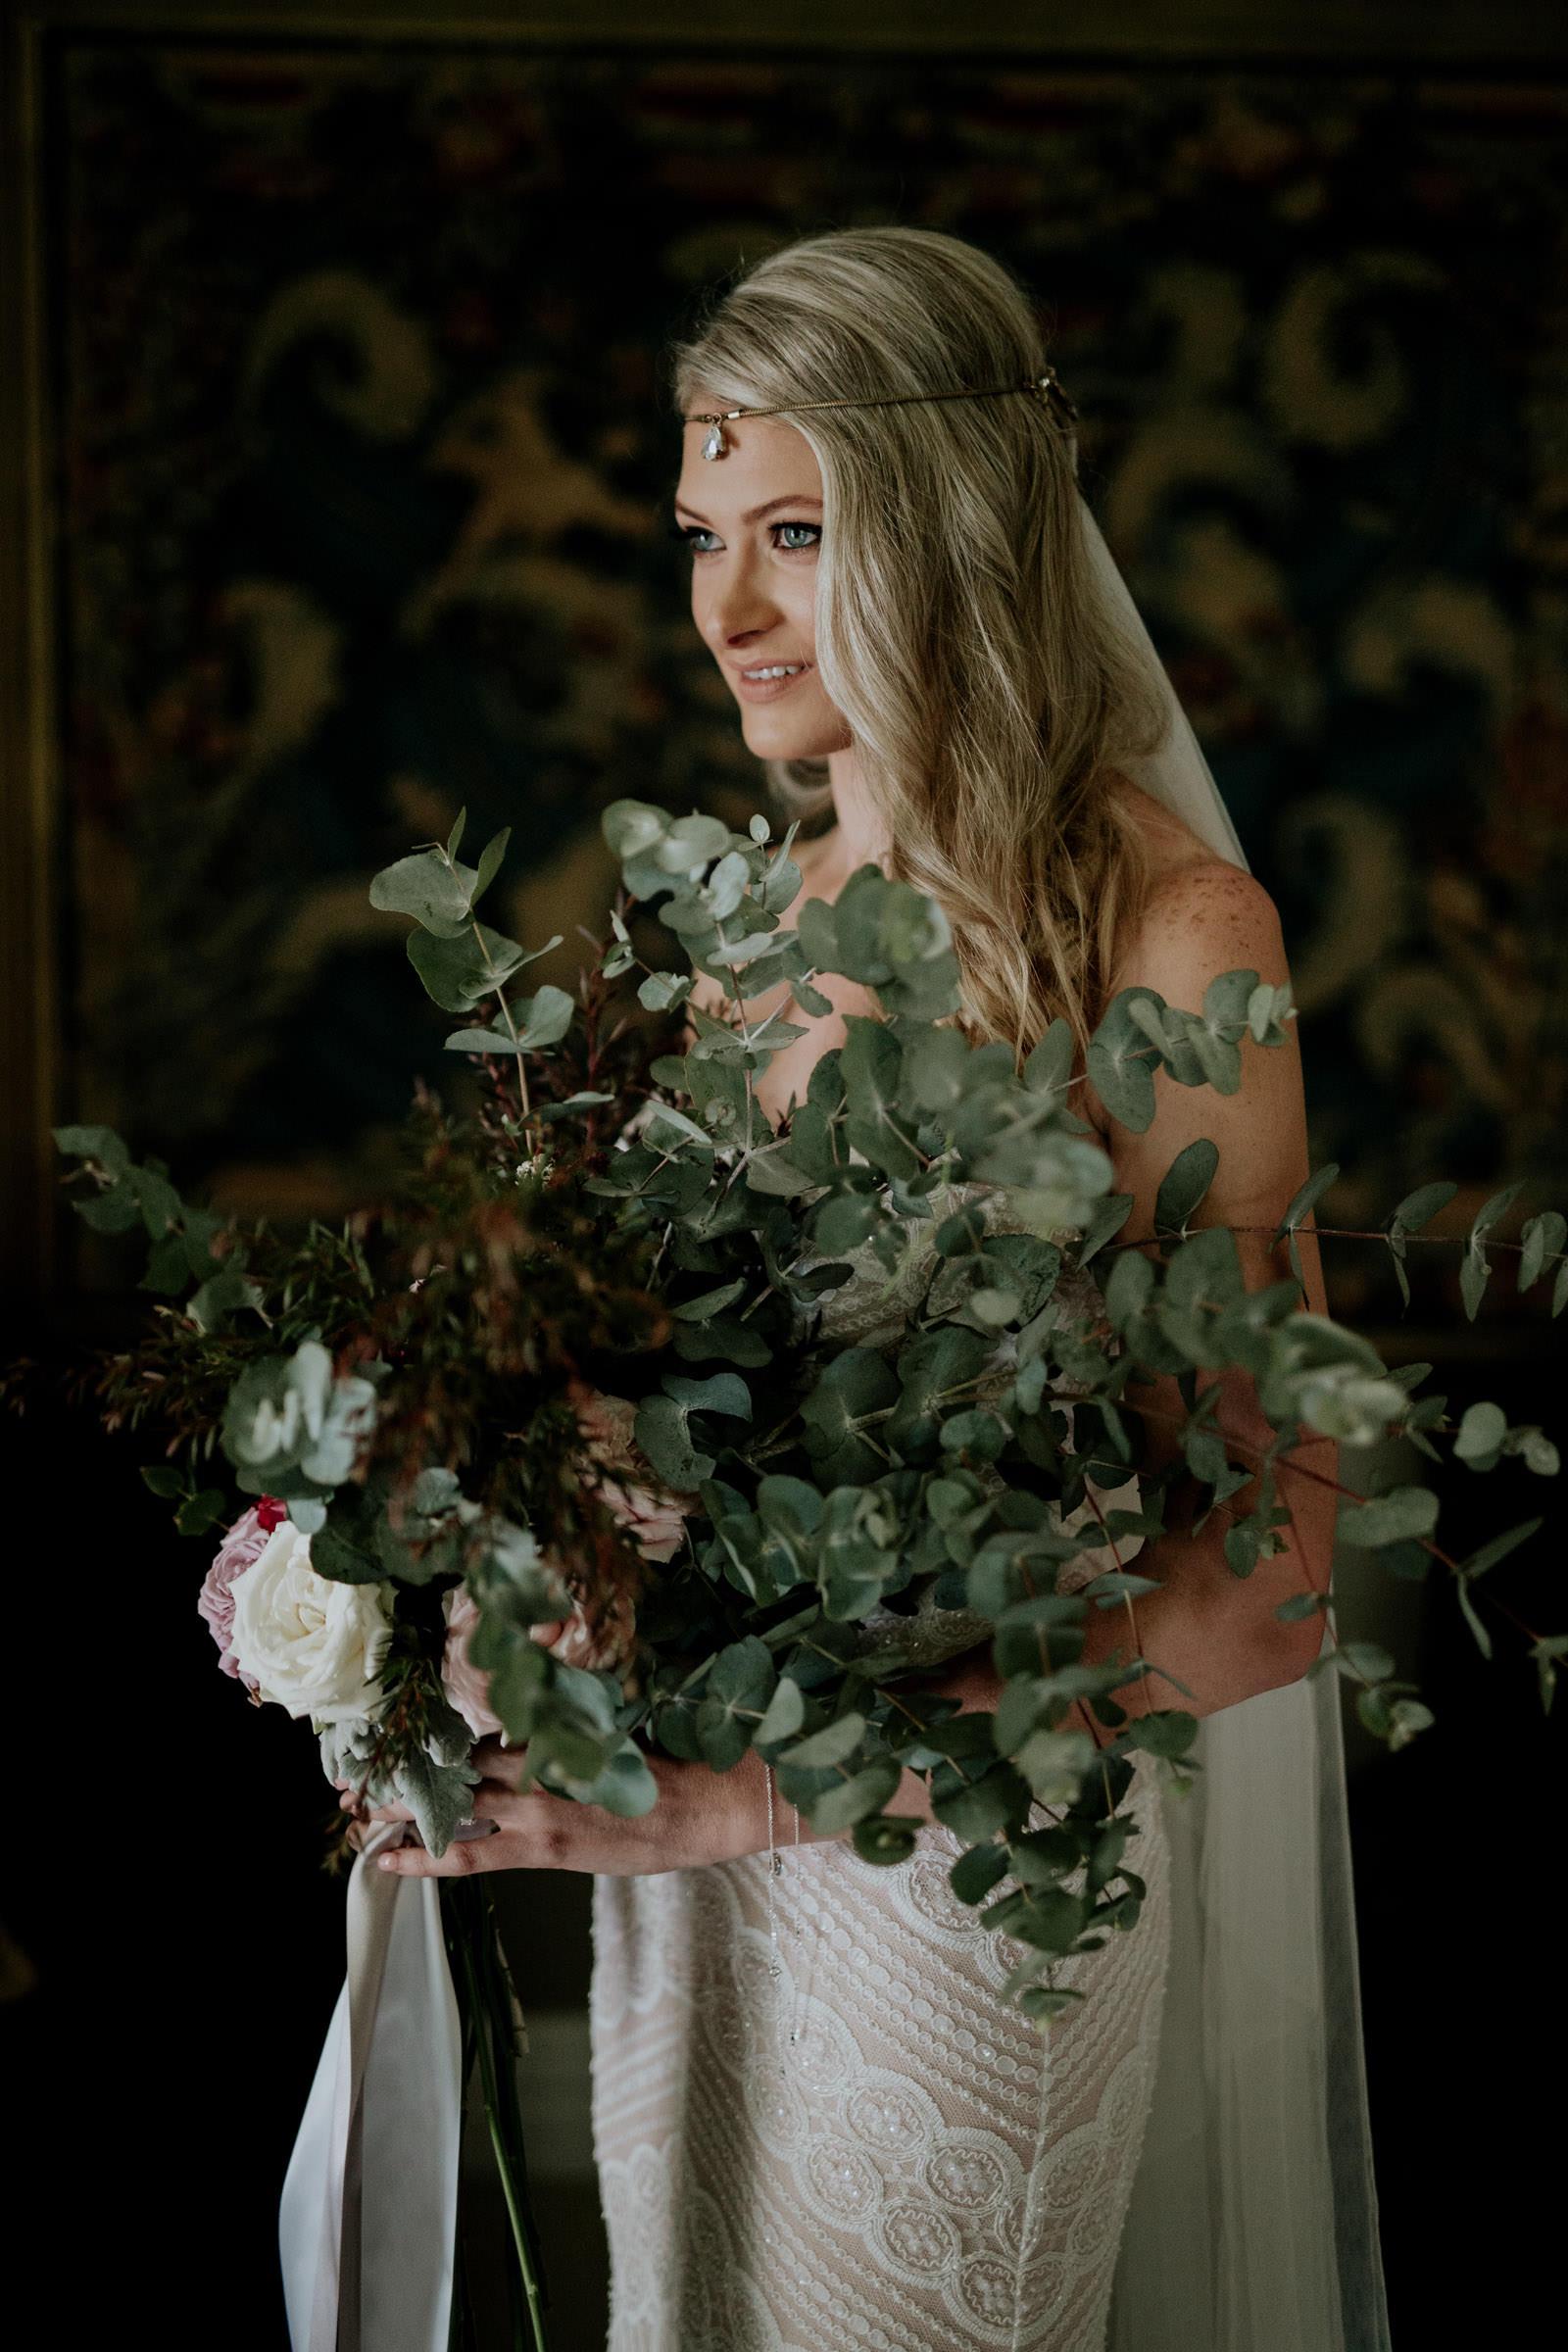 Emma+John+Far+South+Coast+Wedding+Festivl+Glamping+Bush-56.jpg